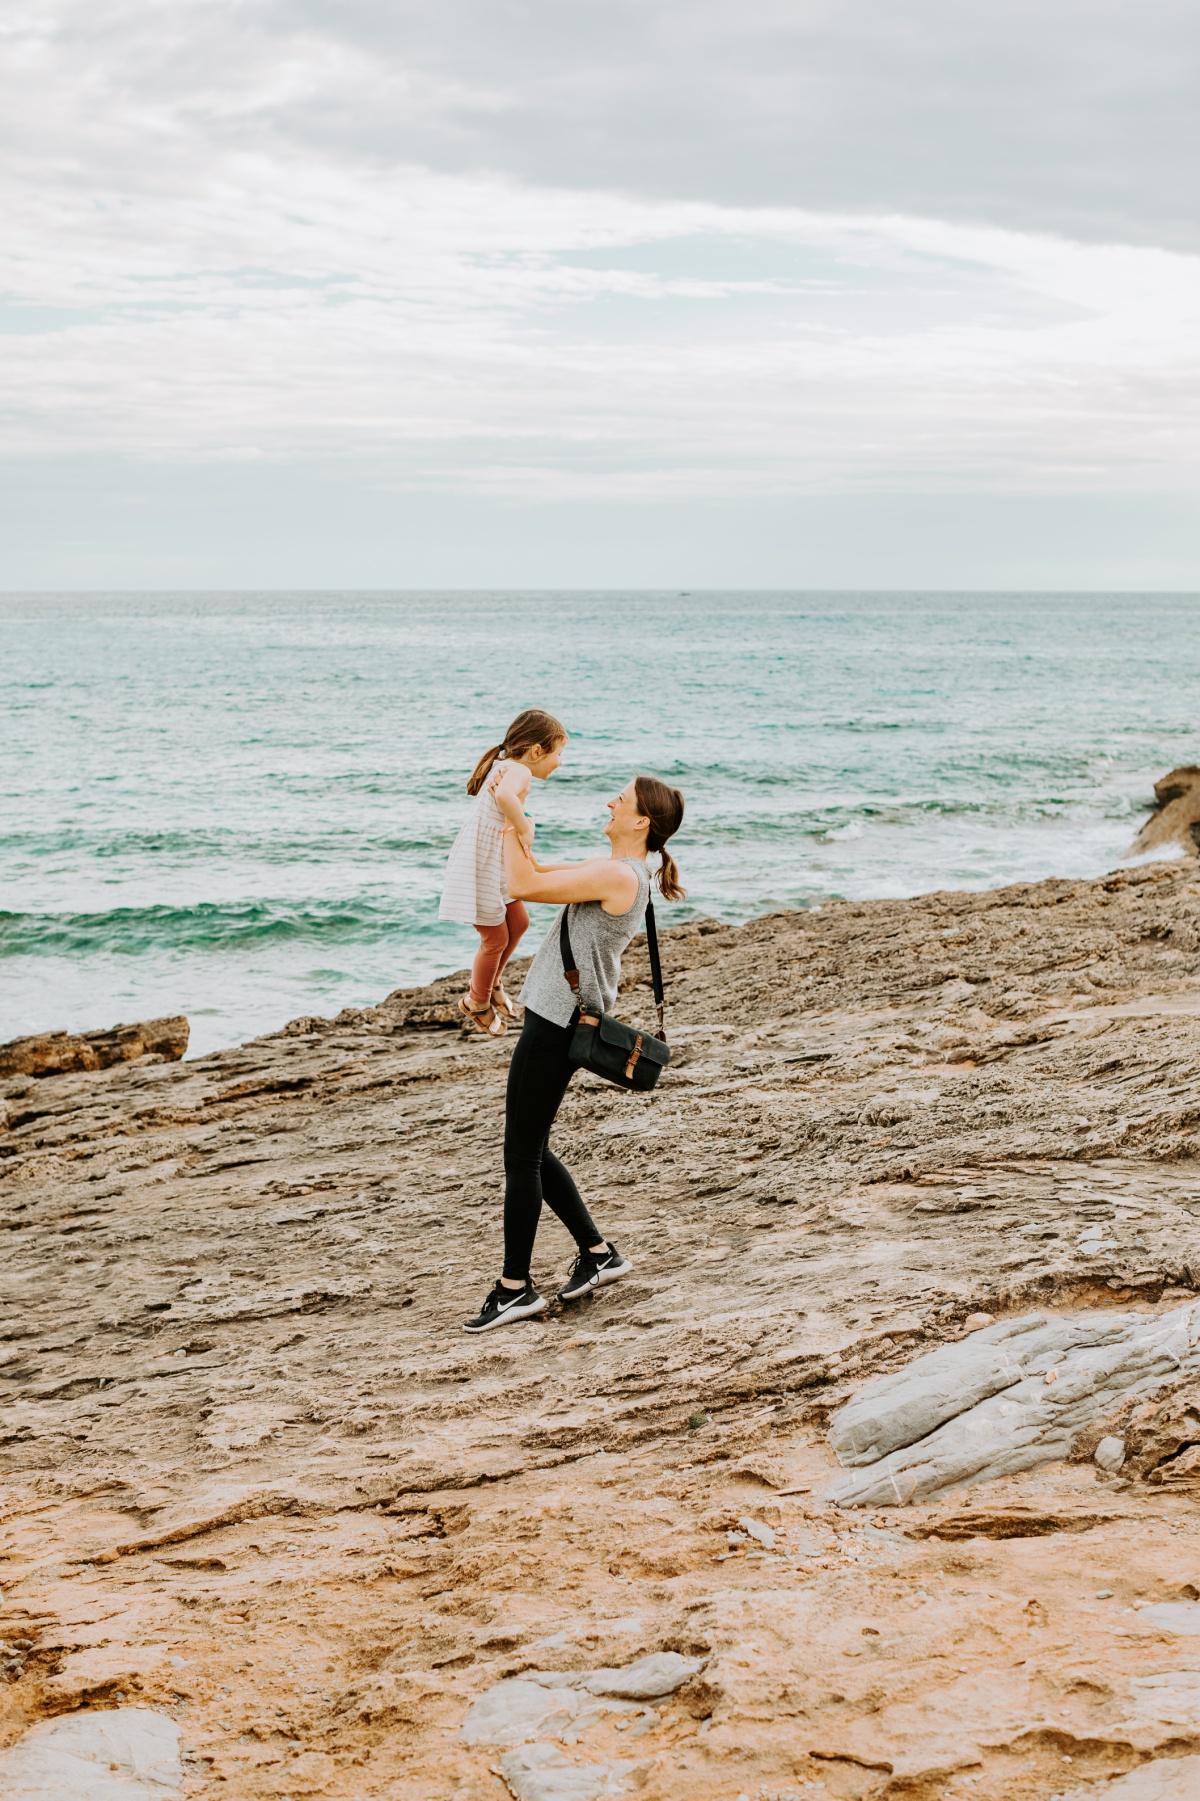 Viva Cala Mesquida Resort beach and boardwalk family vacation